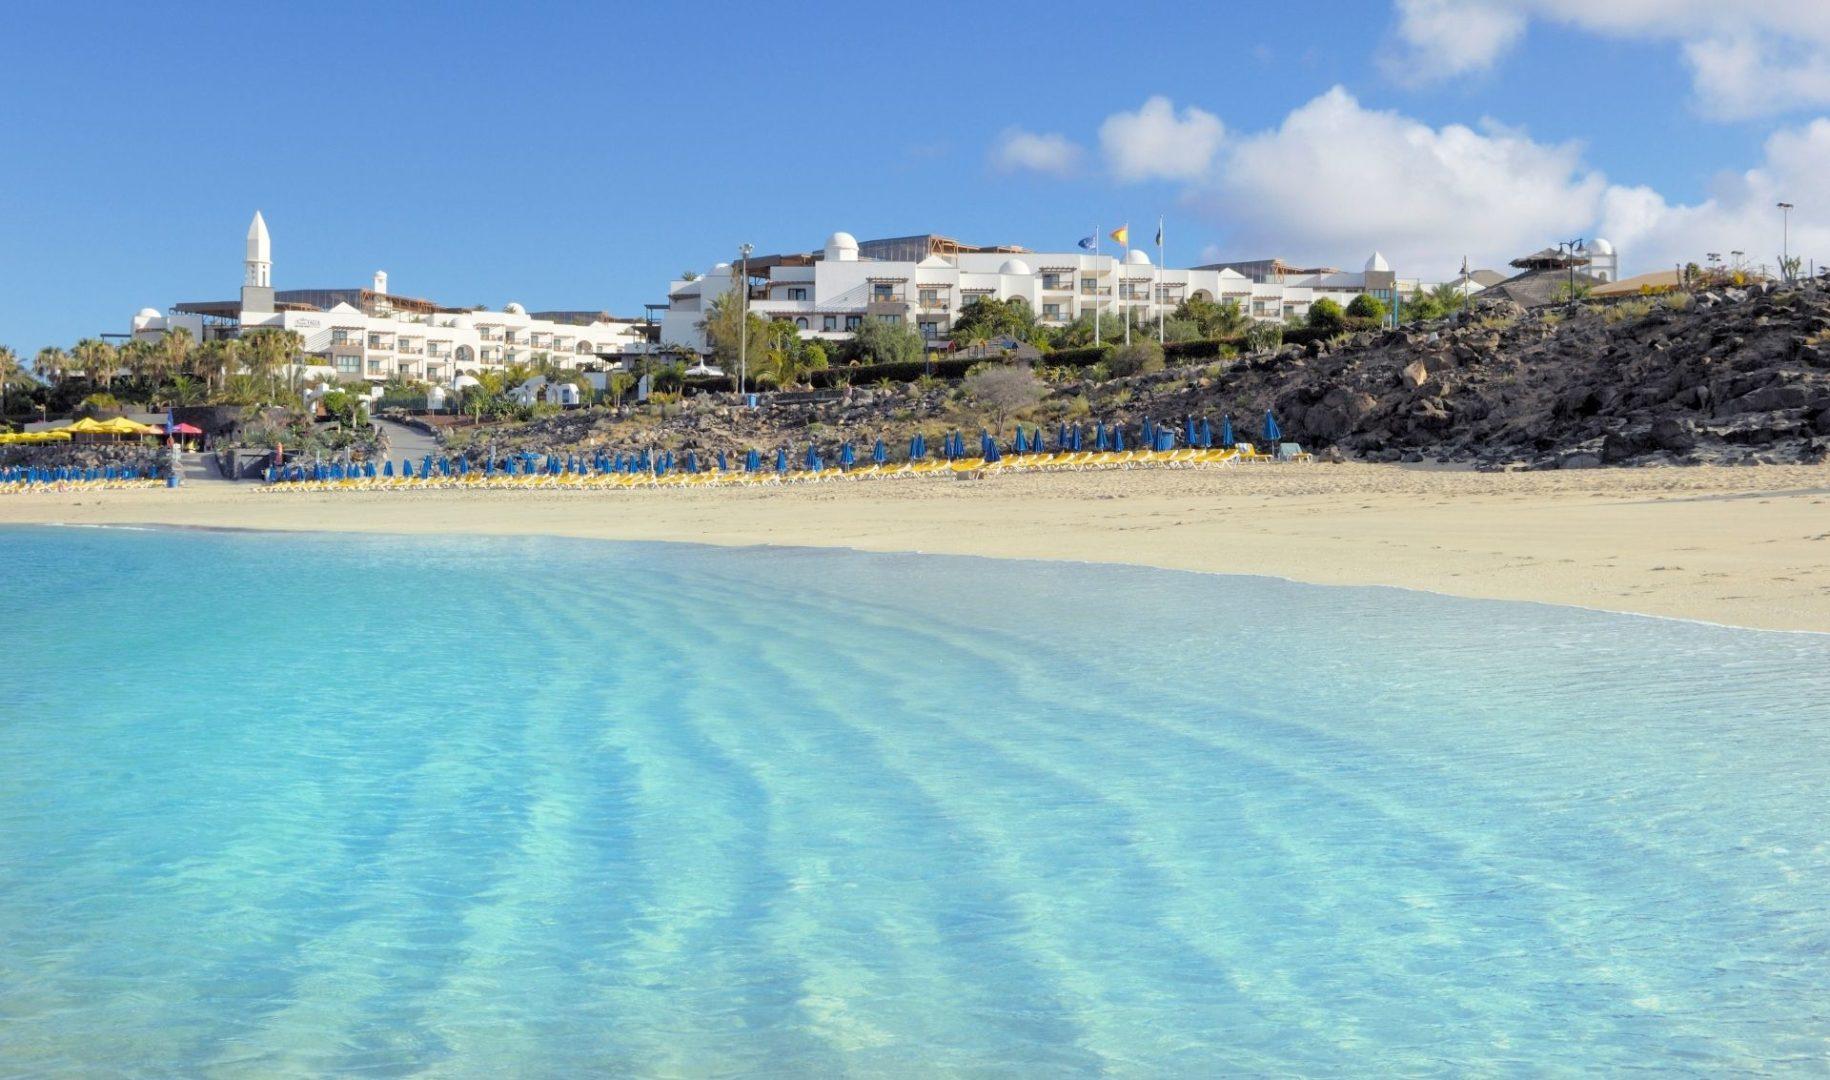 The white sand Playa Dorada